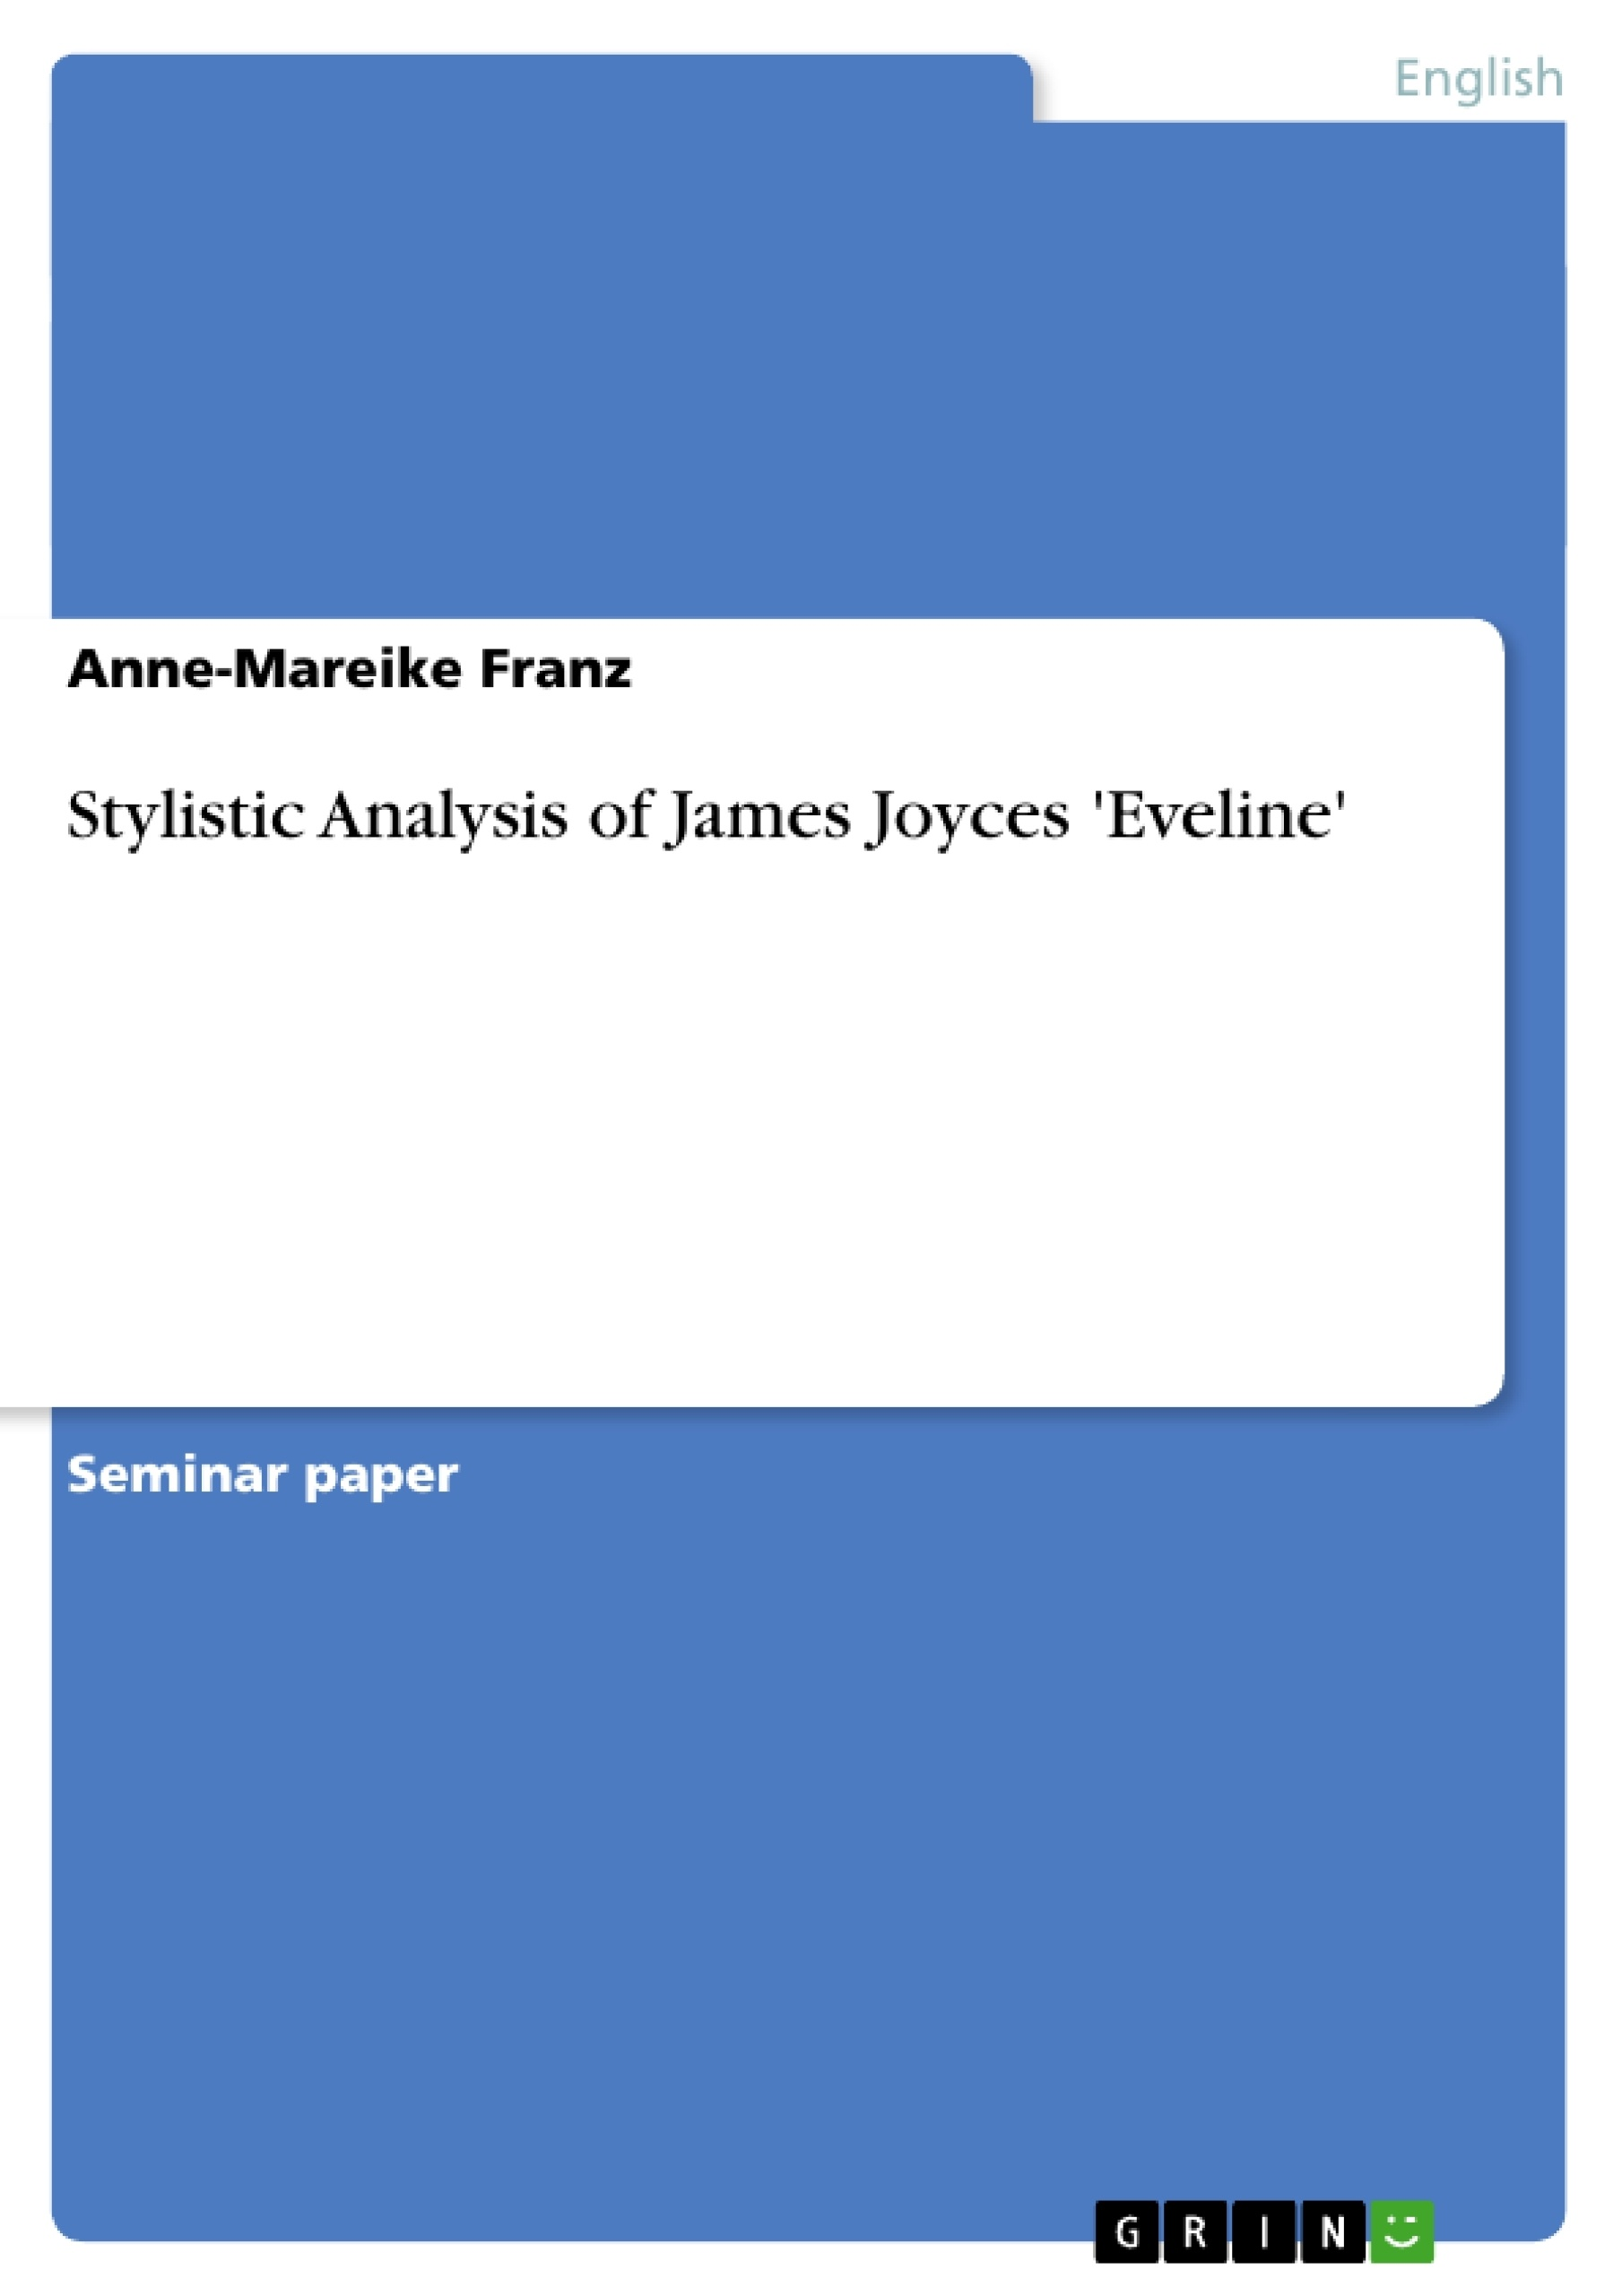 Title: Stylistic Analysis of James Joyces 'Eveline'